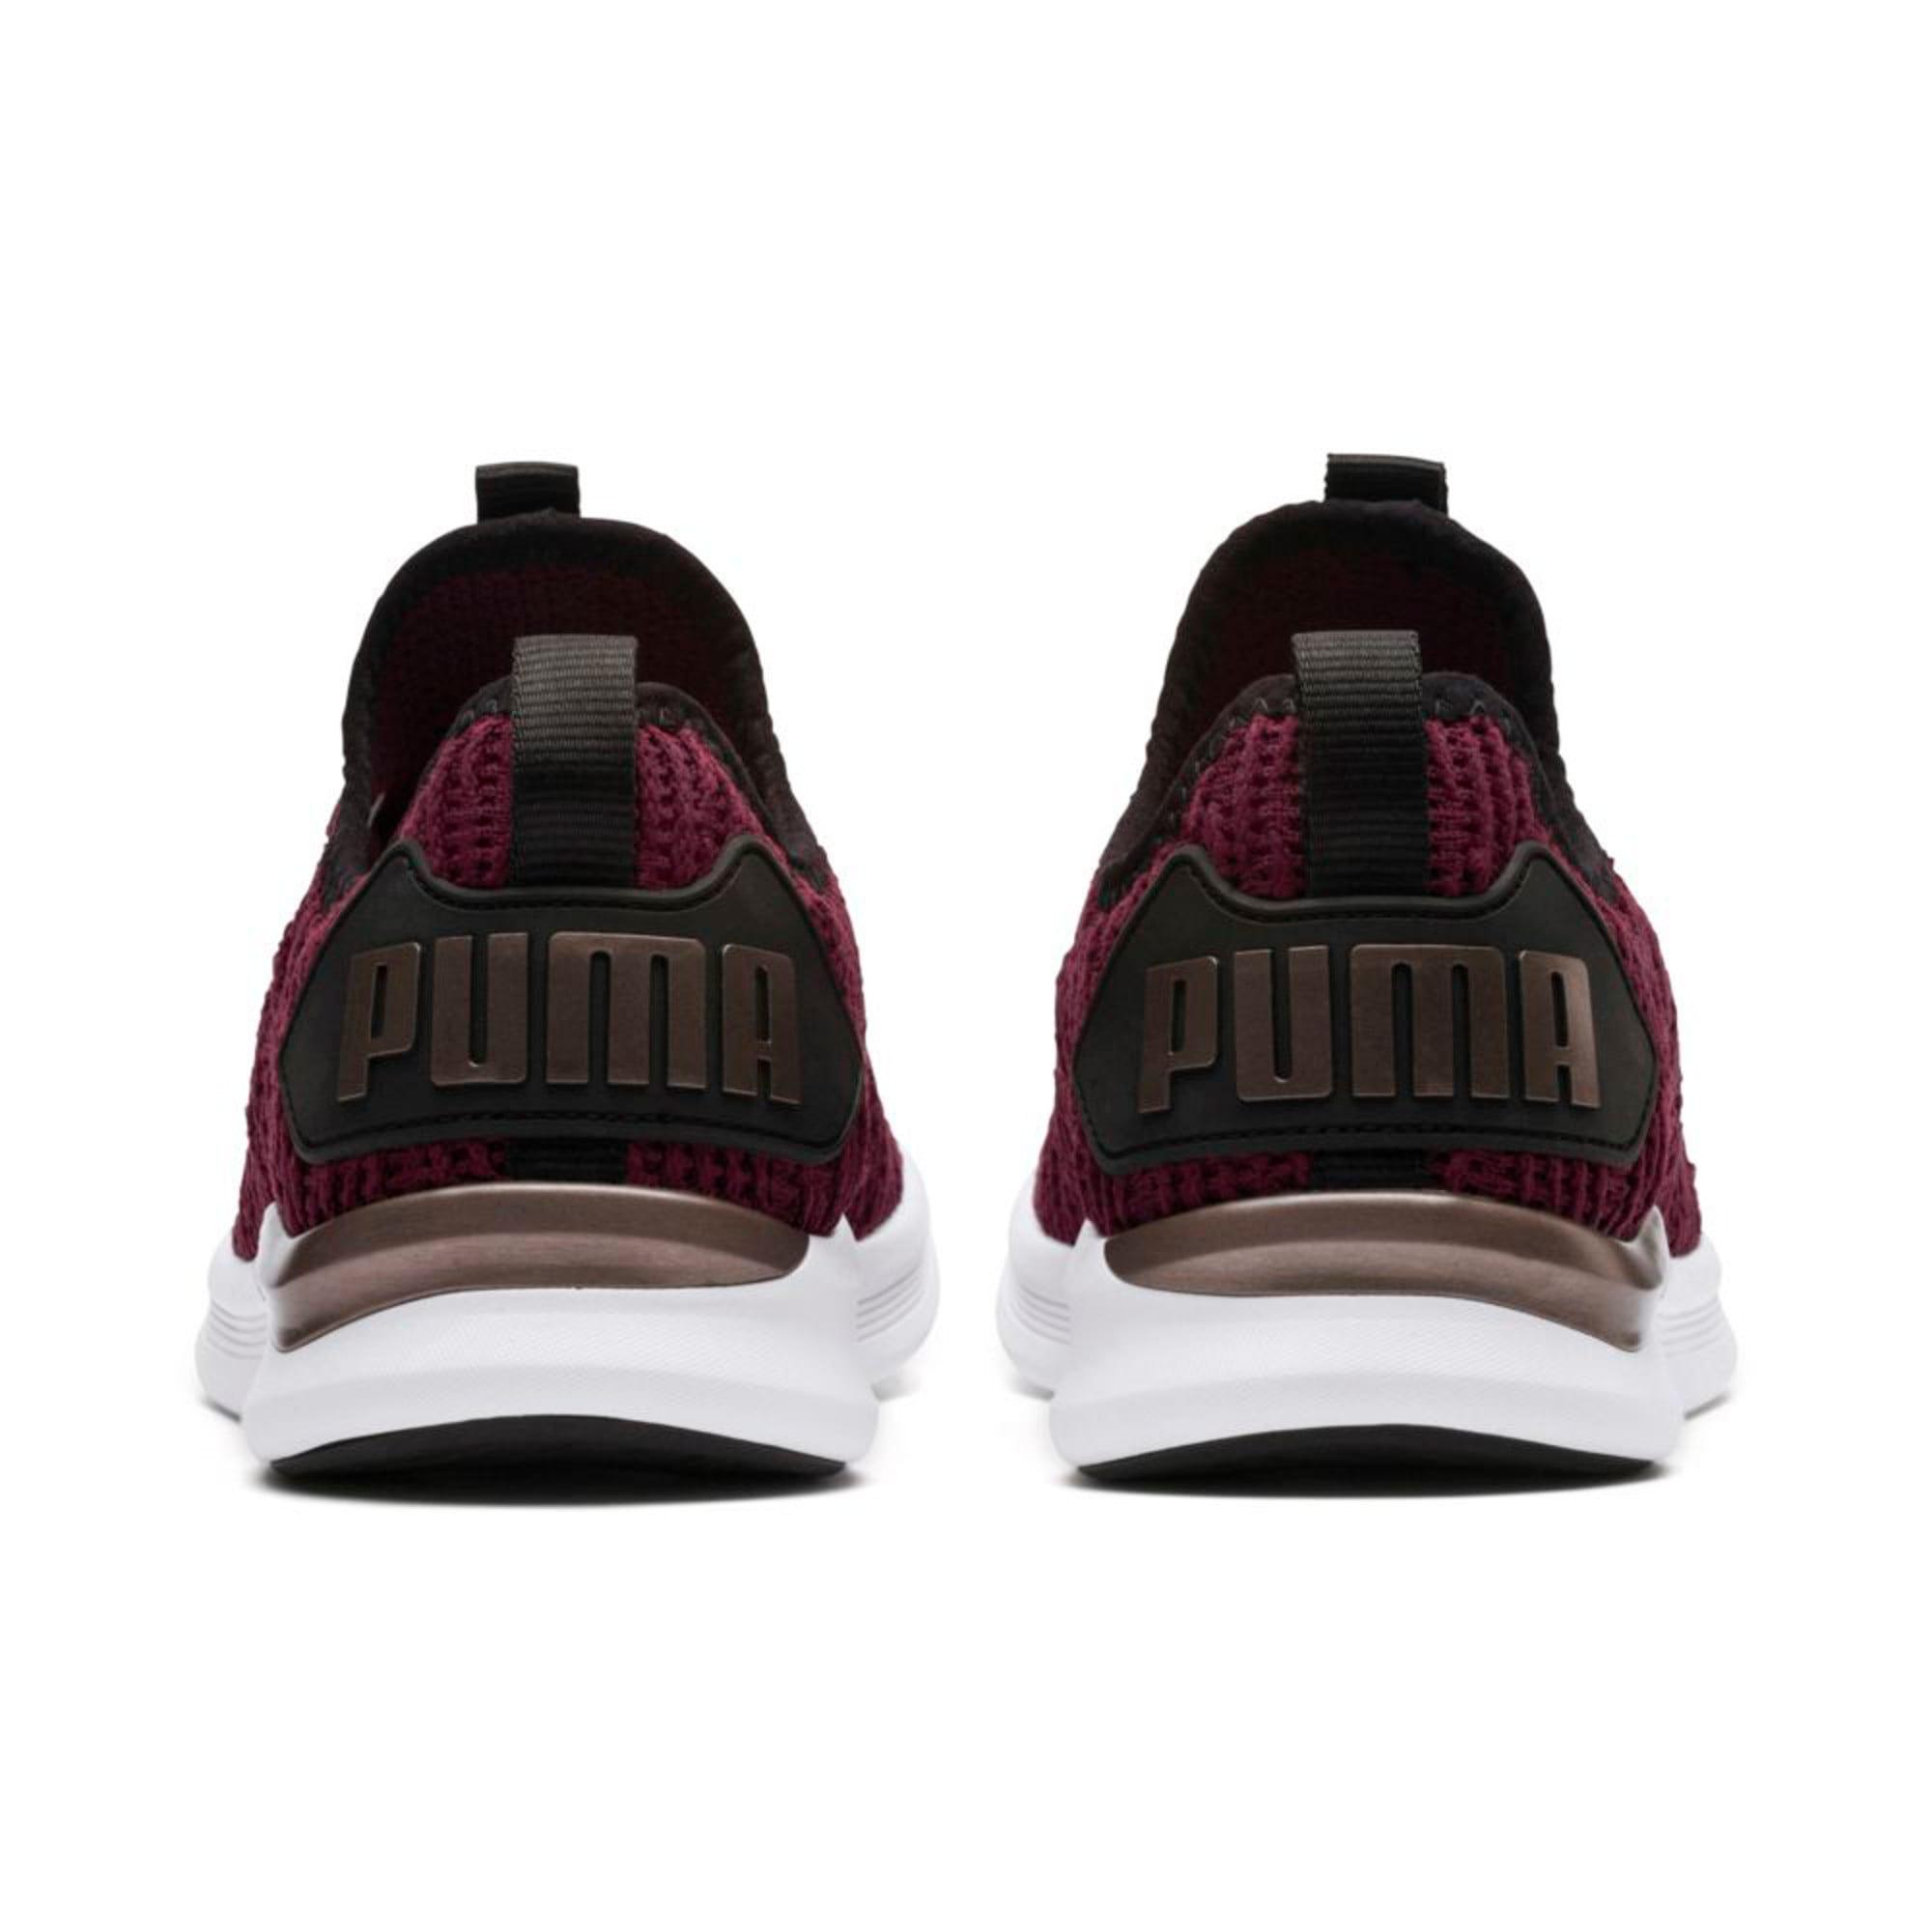 Thumbnail 4 of IGNITE Flash Luxe Women's Running Shoes, Fig-Black-Metallic Ash, medium-IND